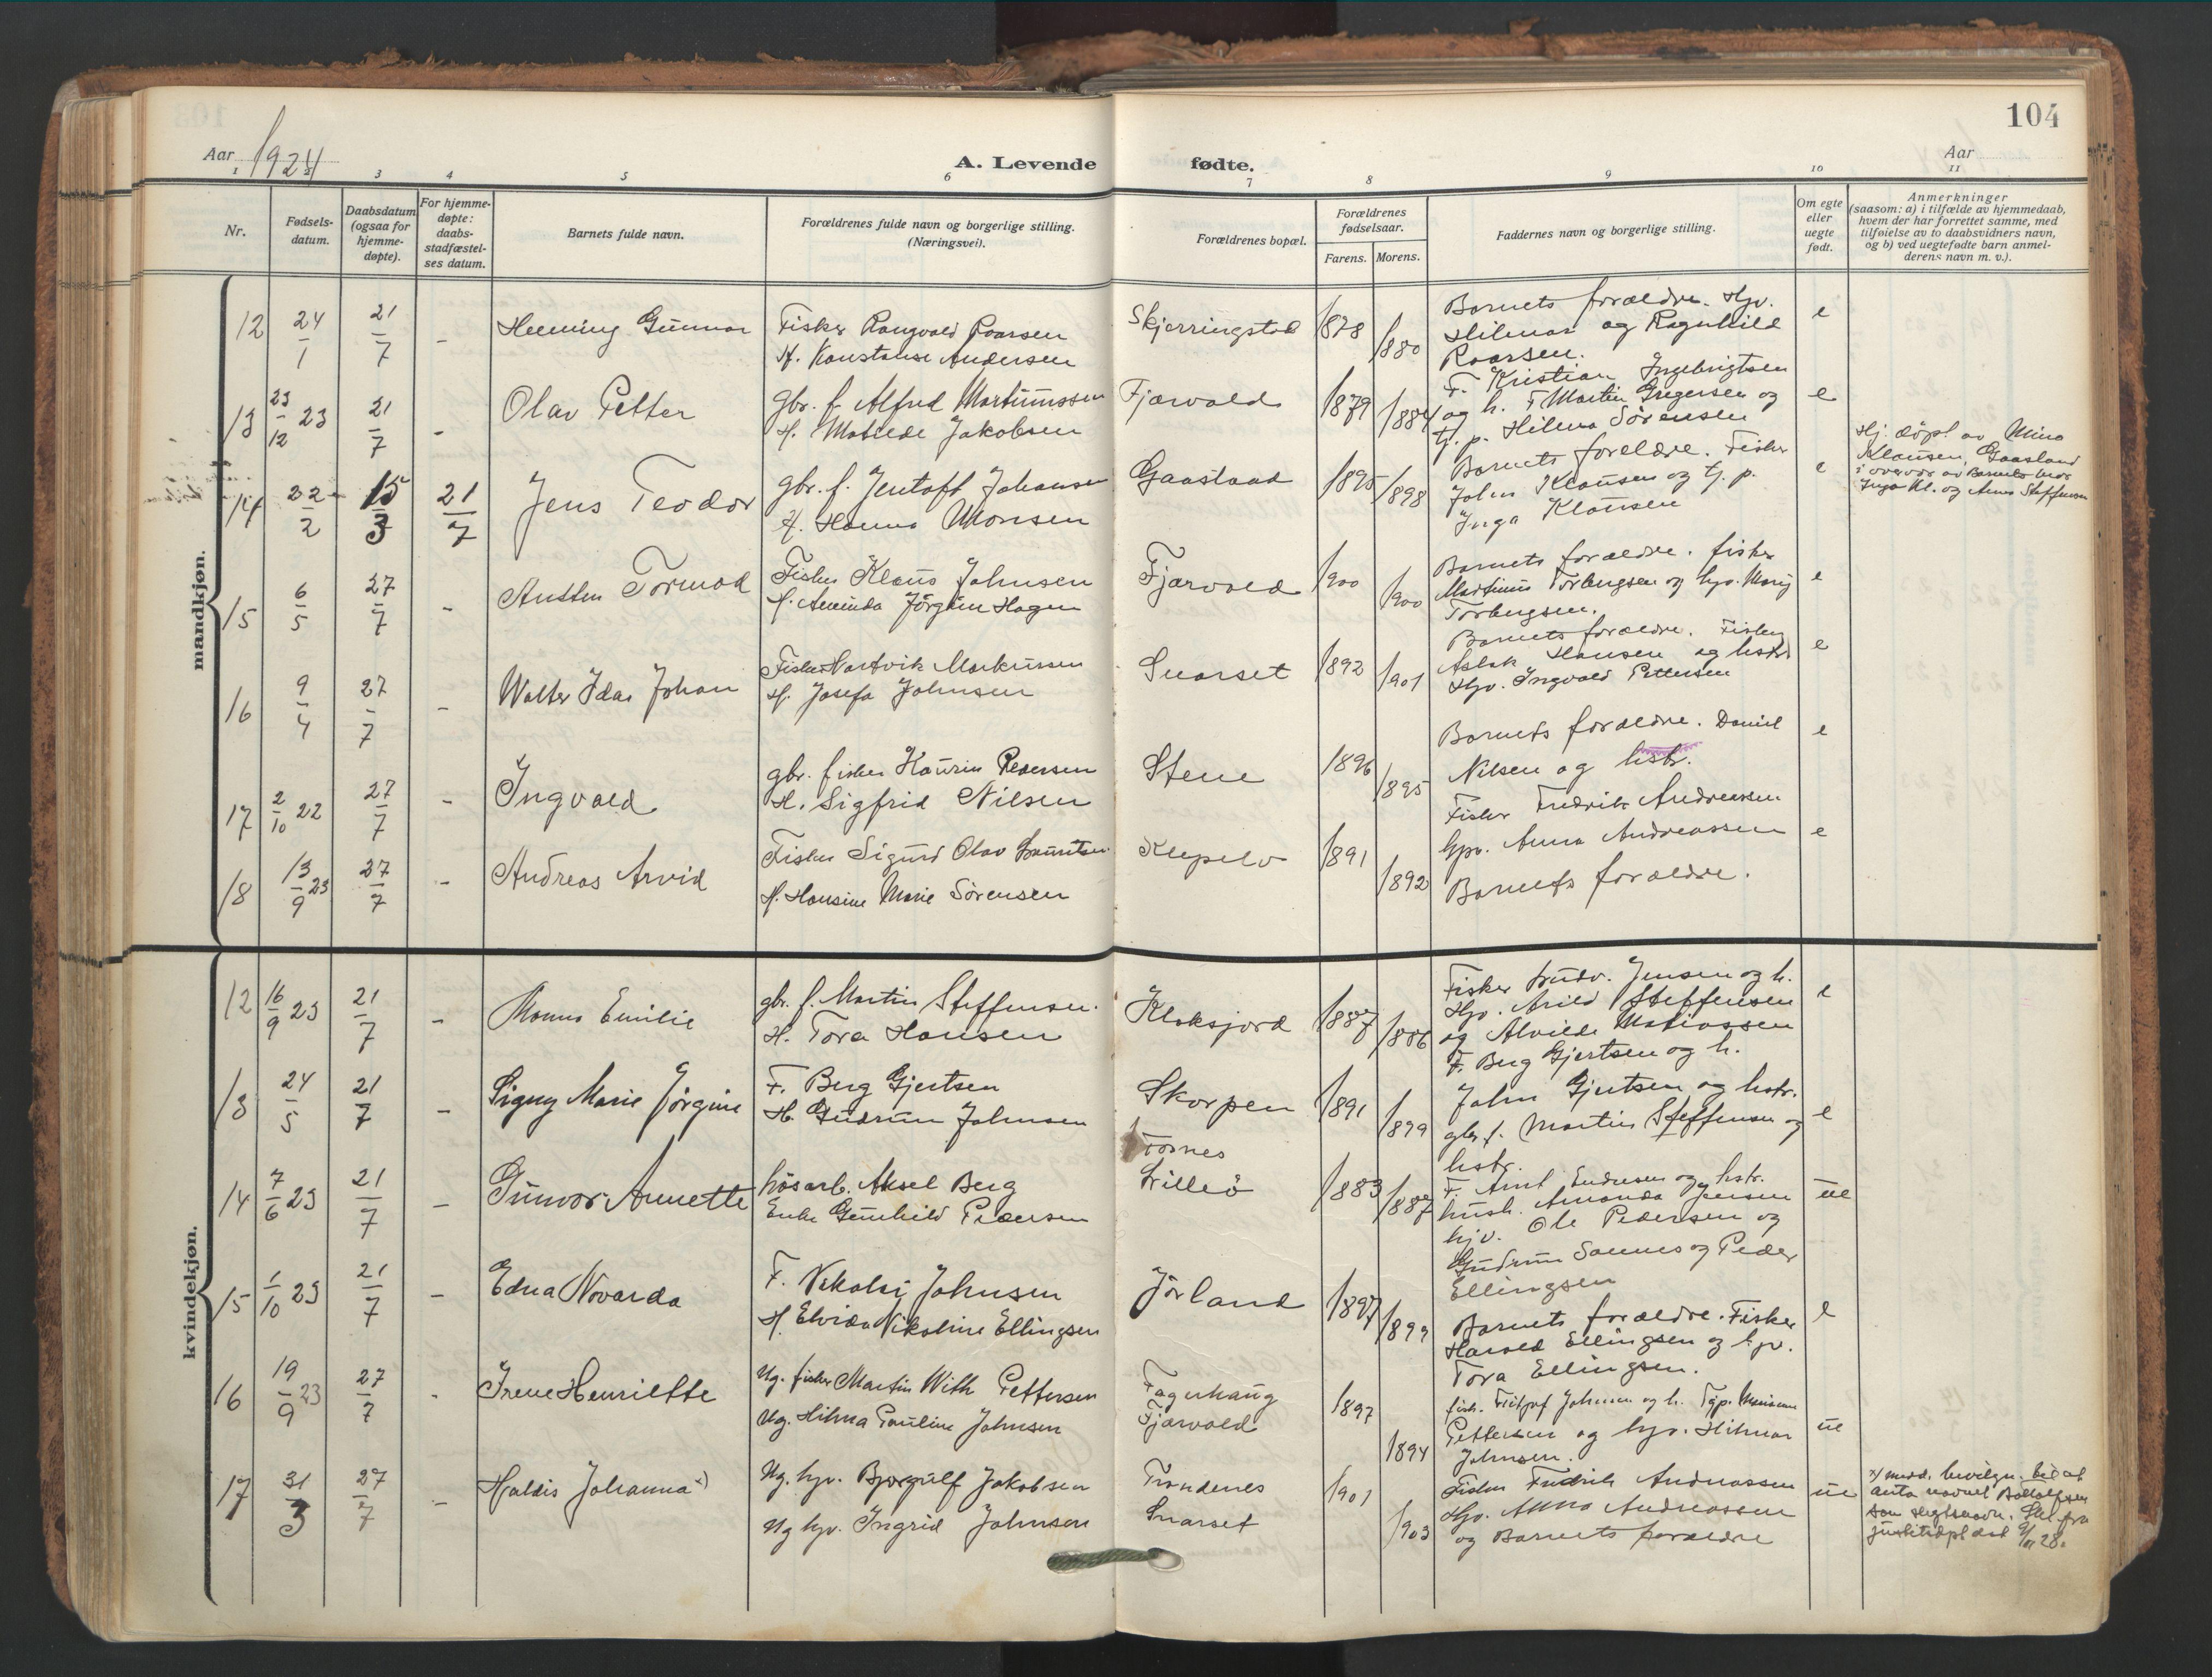 SAT, Ministerialprotokoller, klokkerbøker og fødselsregistre - Nordland, 891/L1306: Ministerialbok nr. 891A11, 1911-1927, s. 104